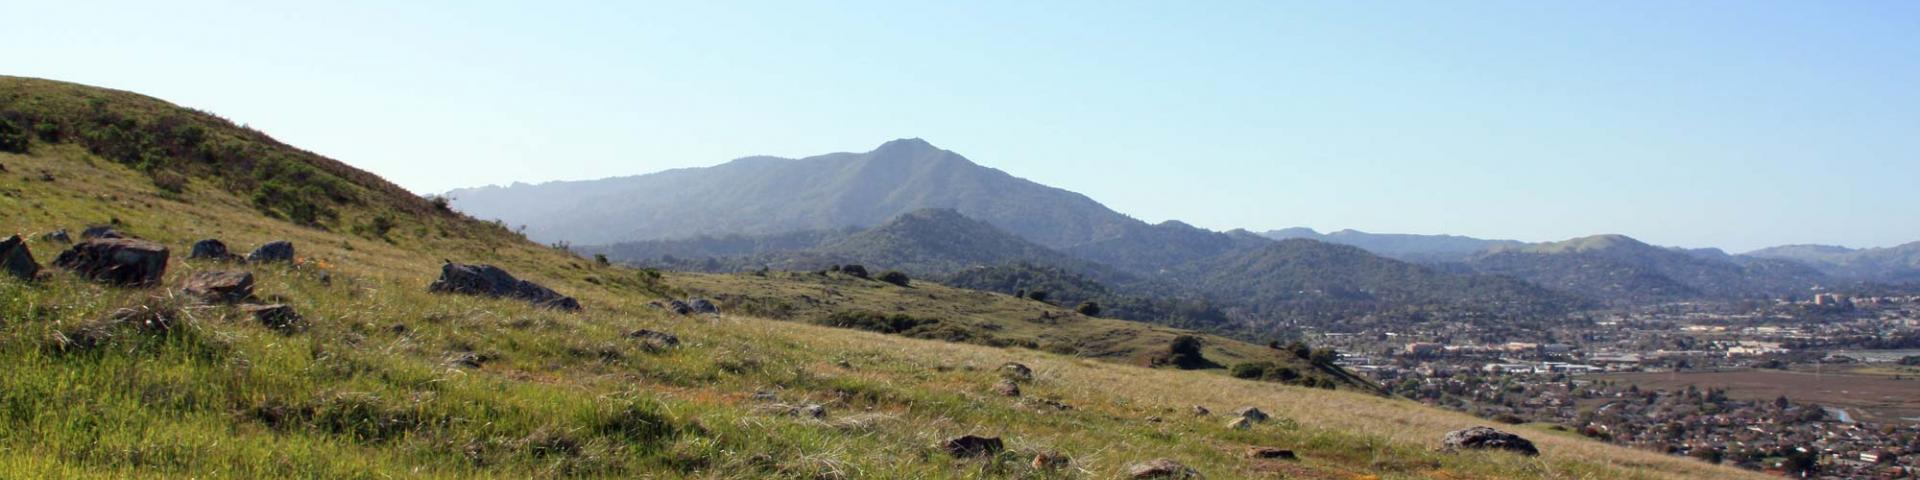 Mt. Tam Marin County